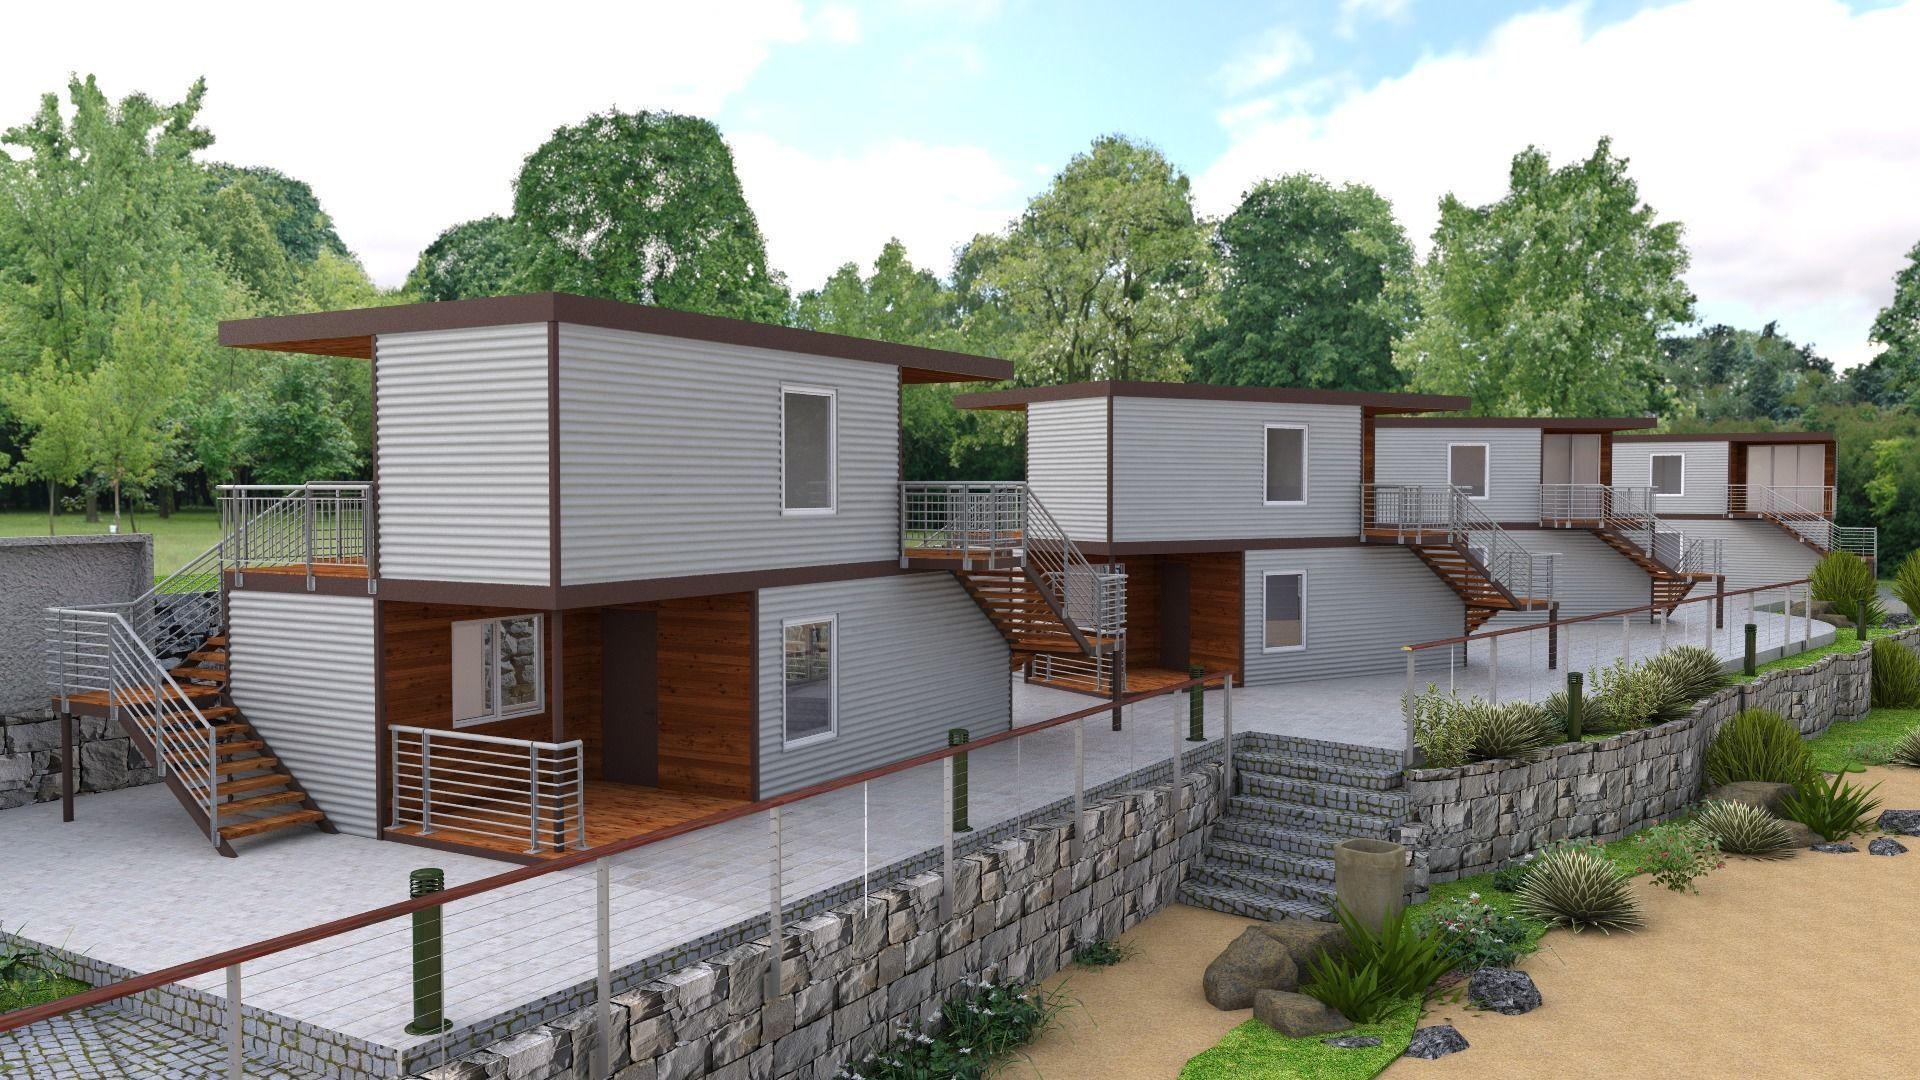 Recreation Center Houses